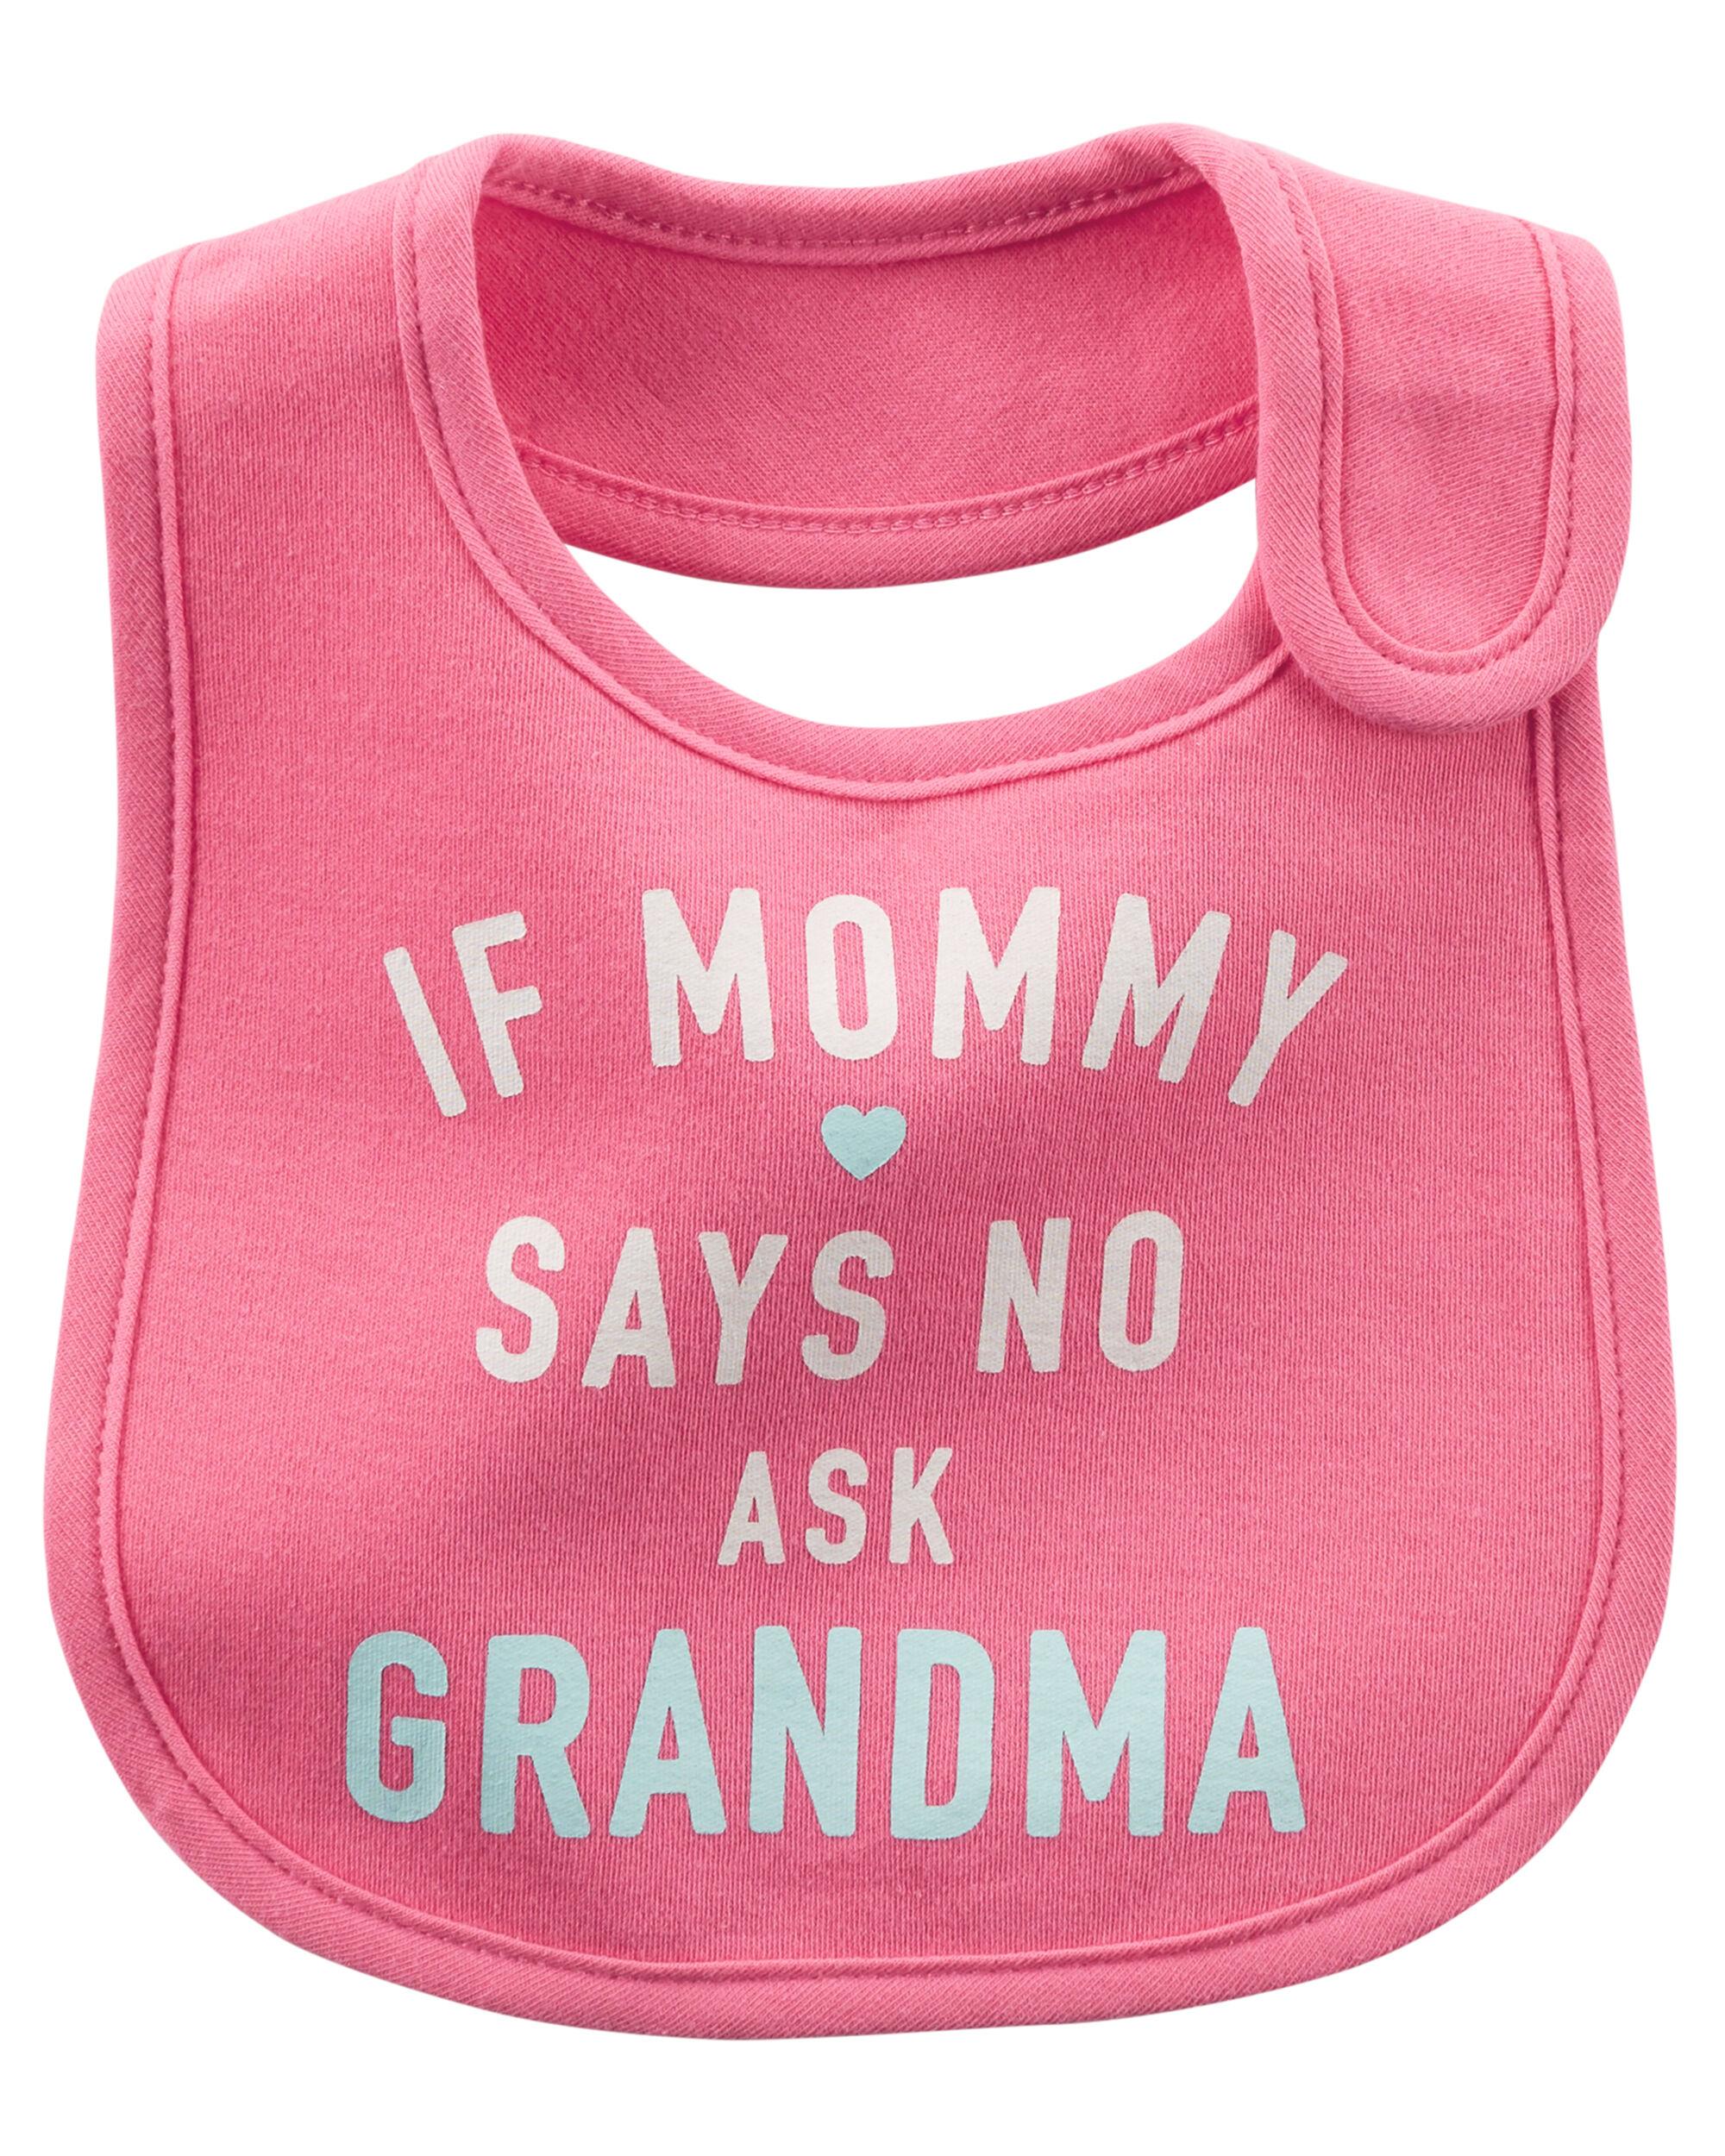 Ask Grandma Teething Bib Carters Com